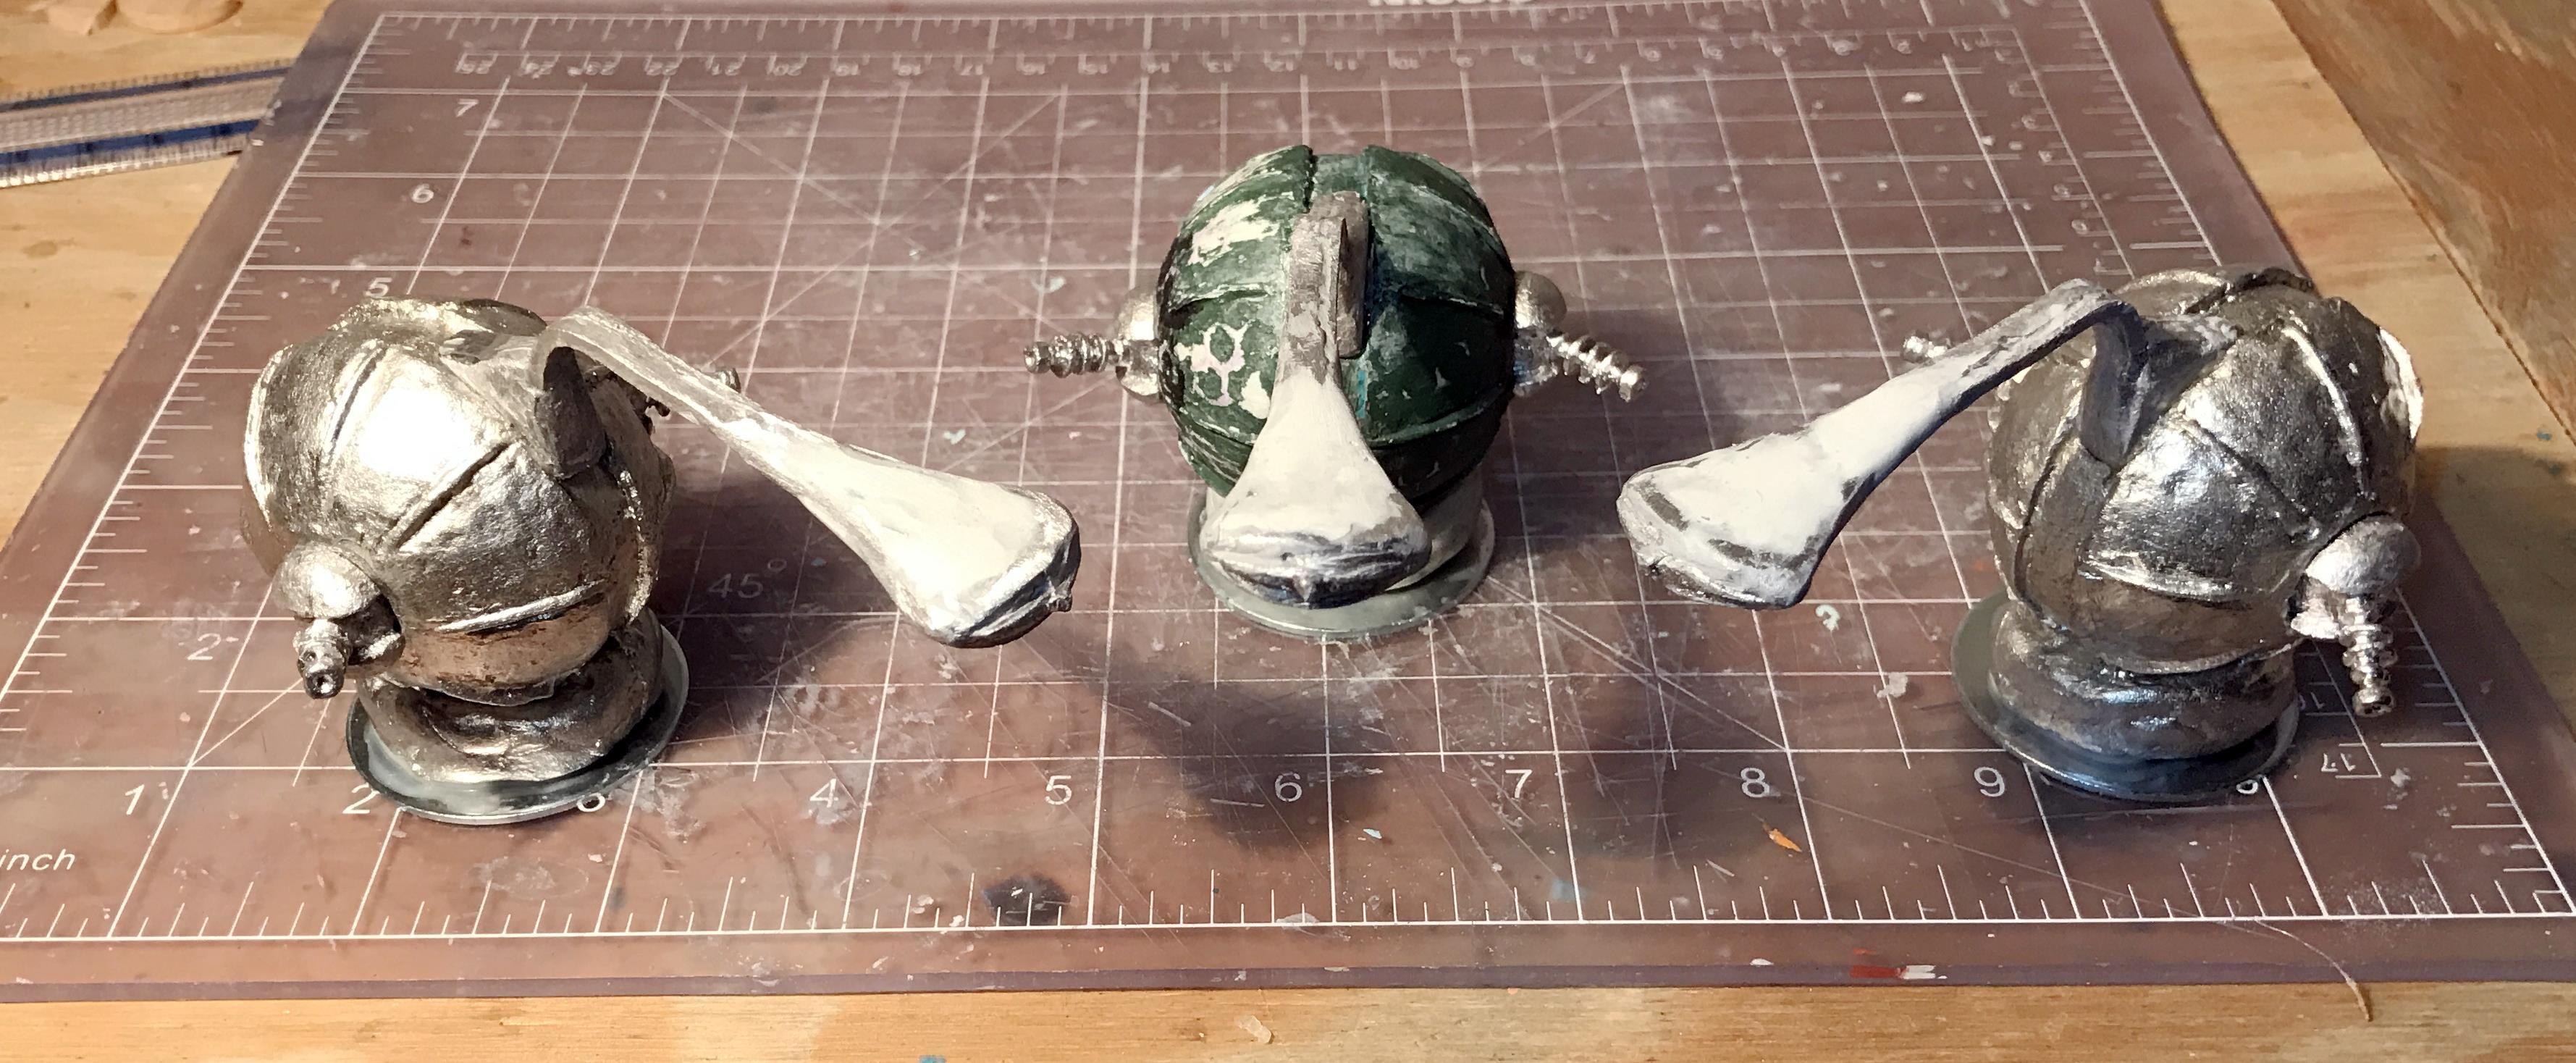 25-mark-1-tanks-before-priming-front